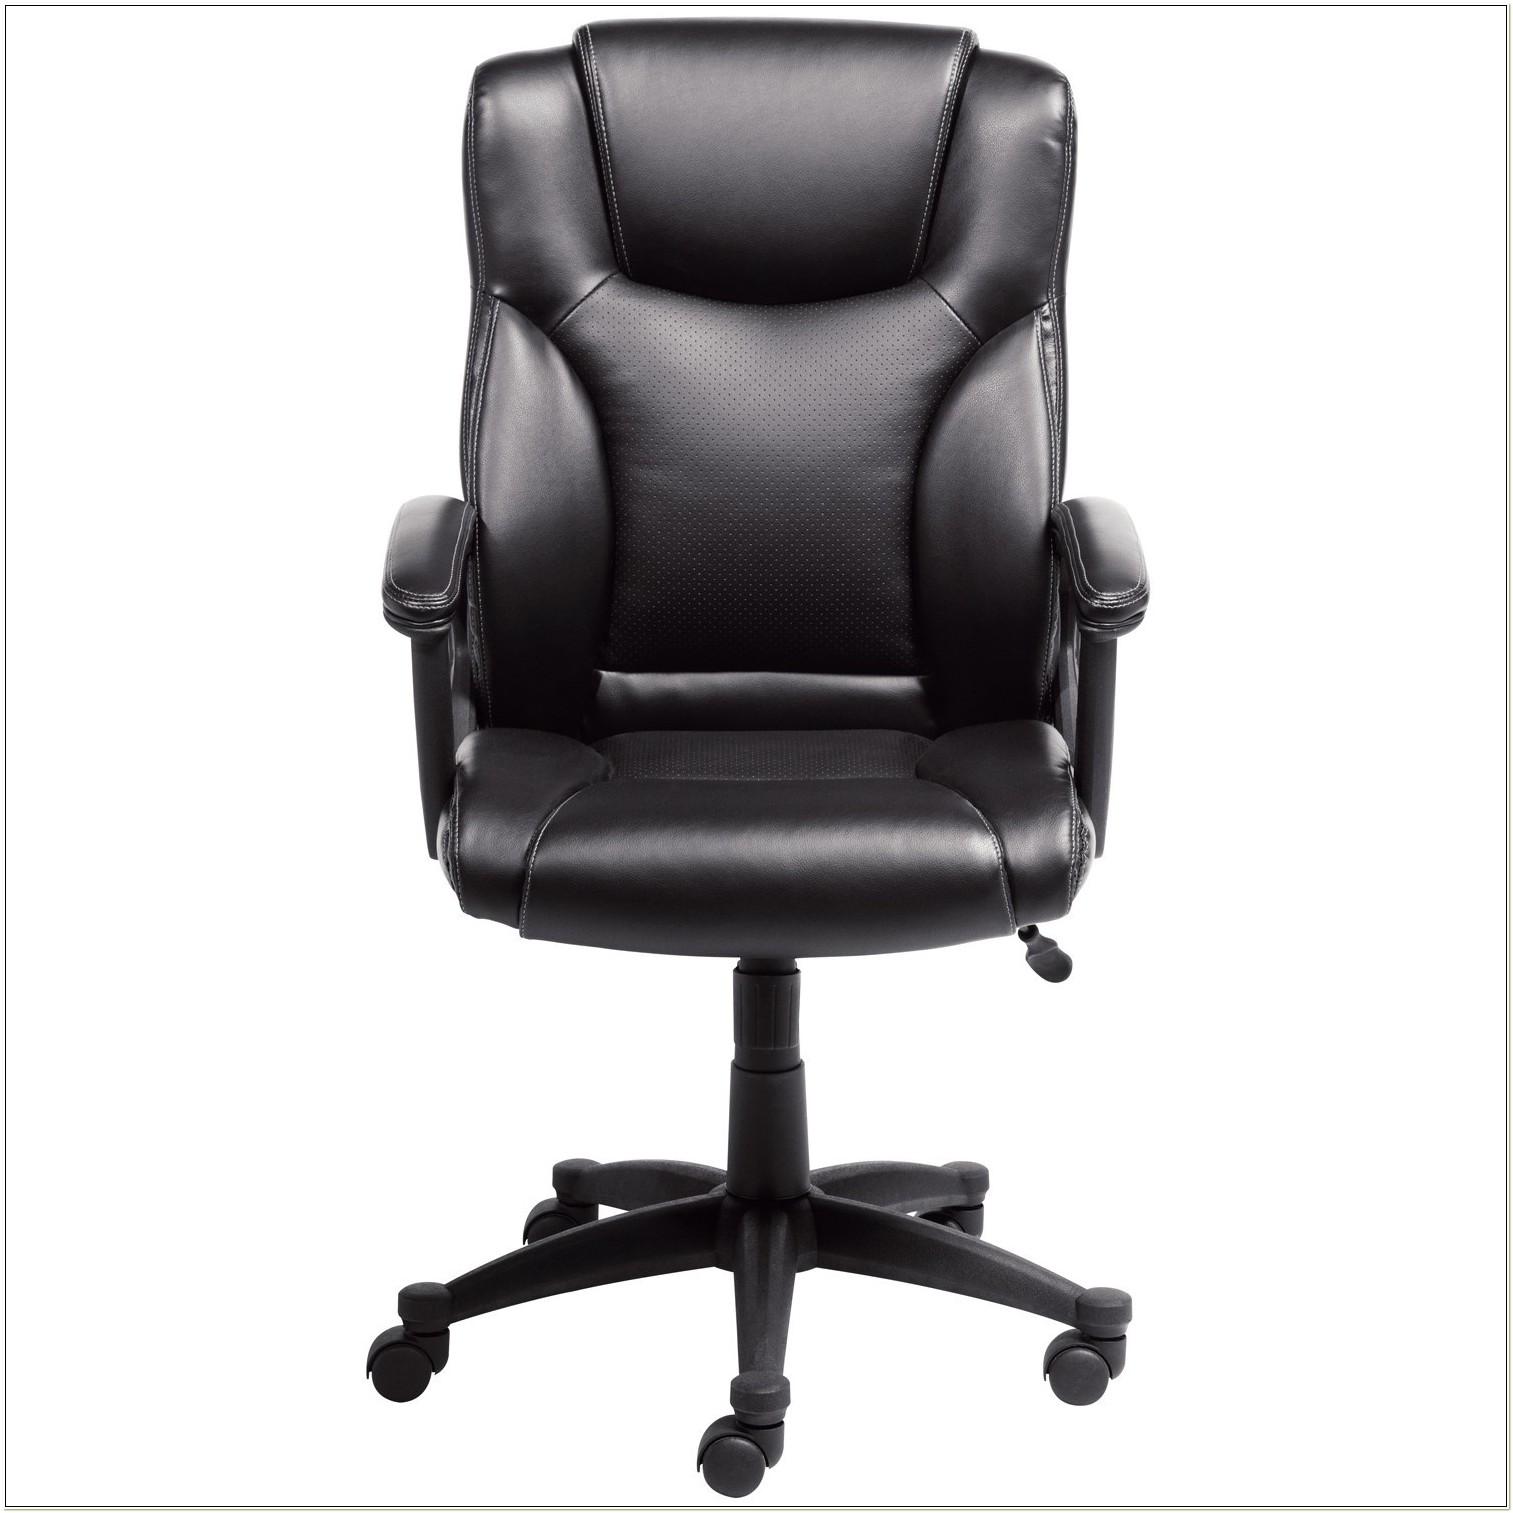 Serta 43672 Bonded Leather Executive Chair Black